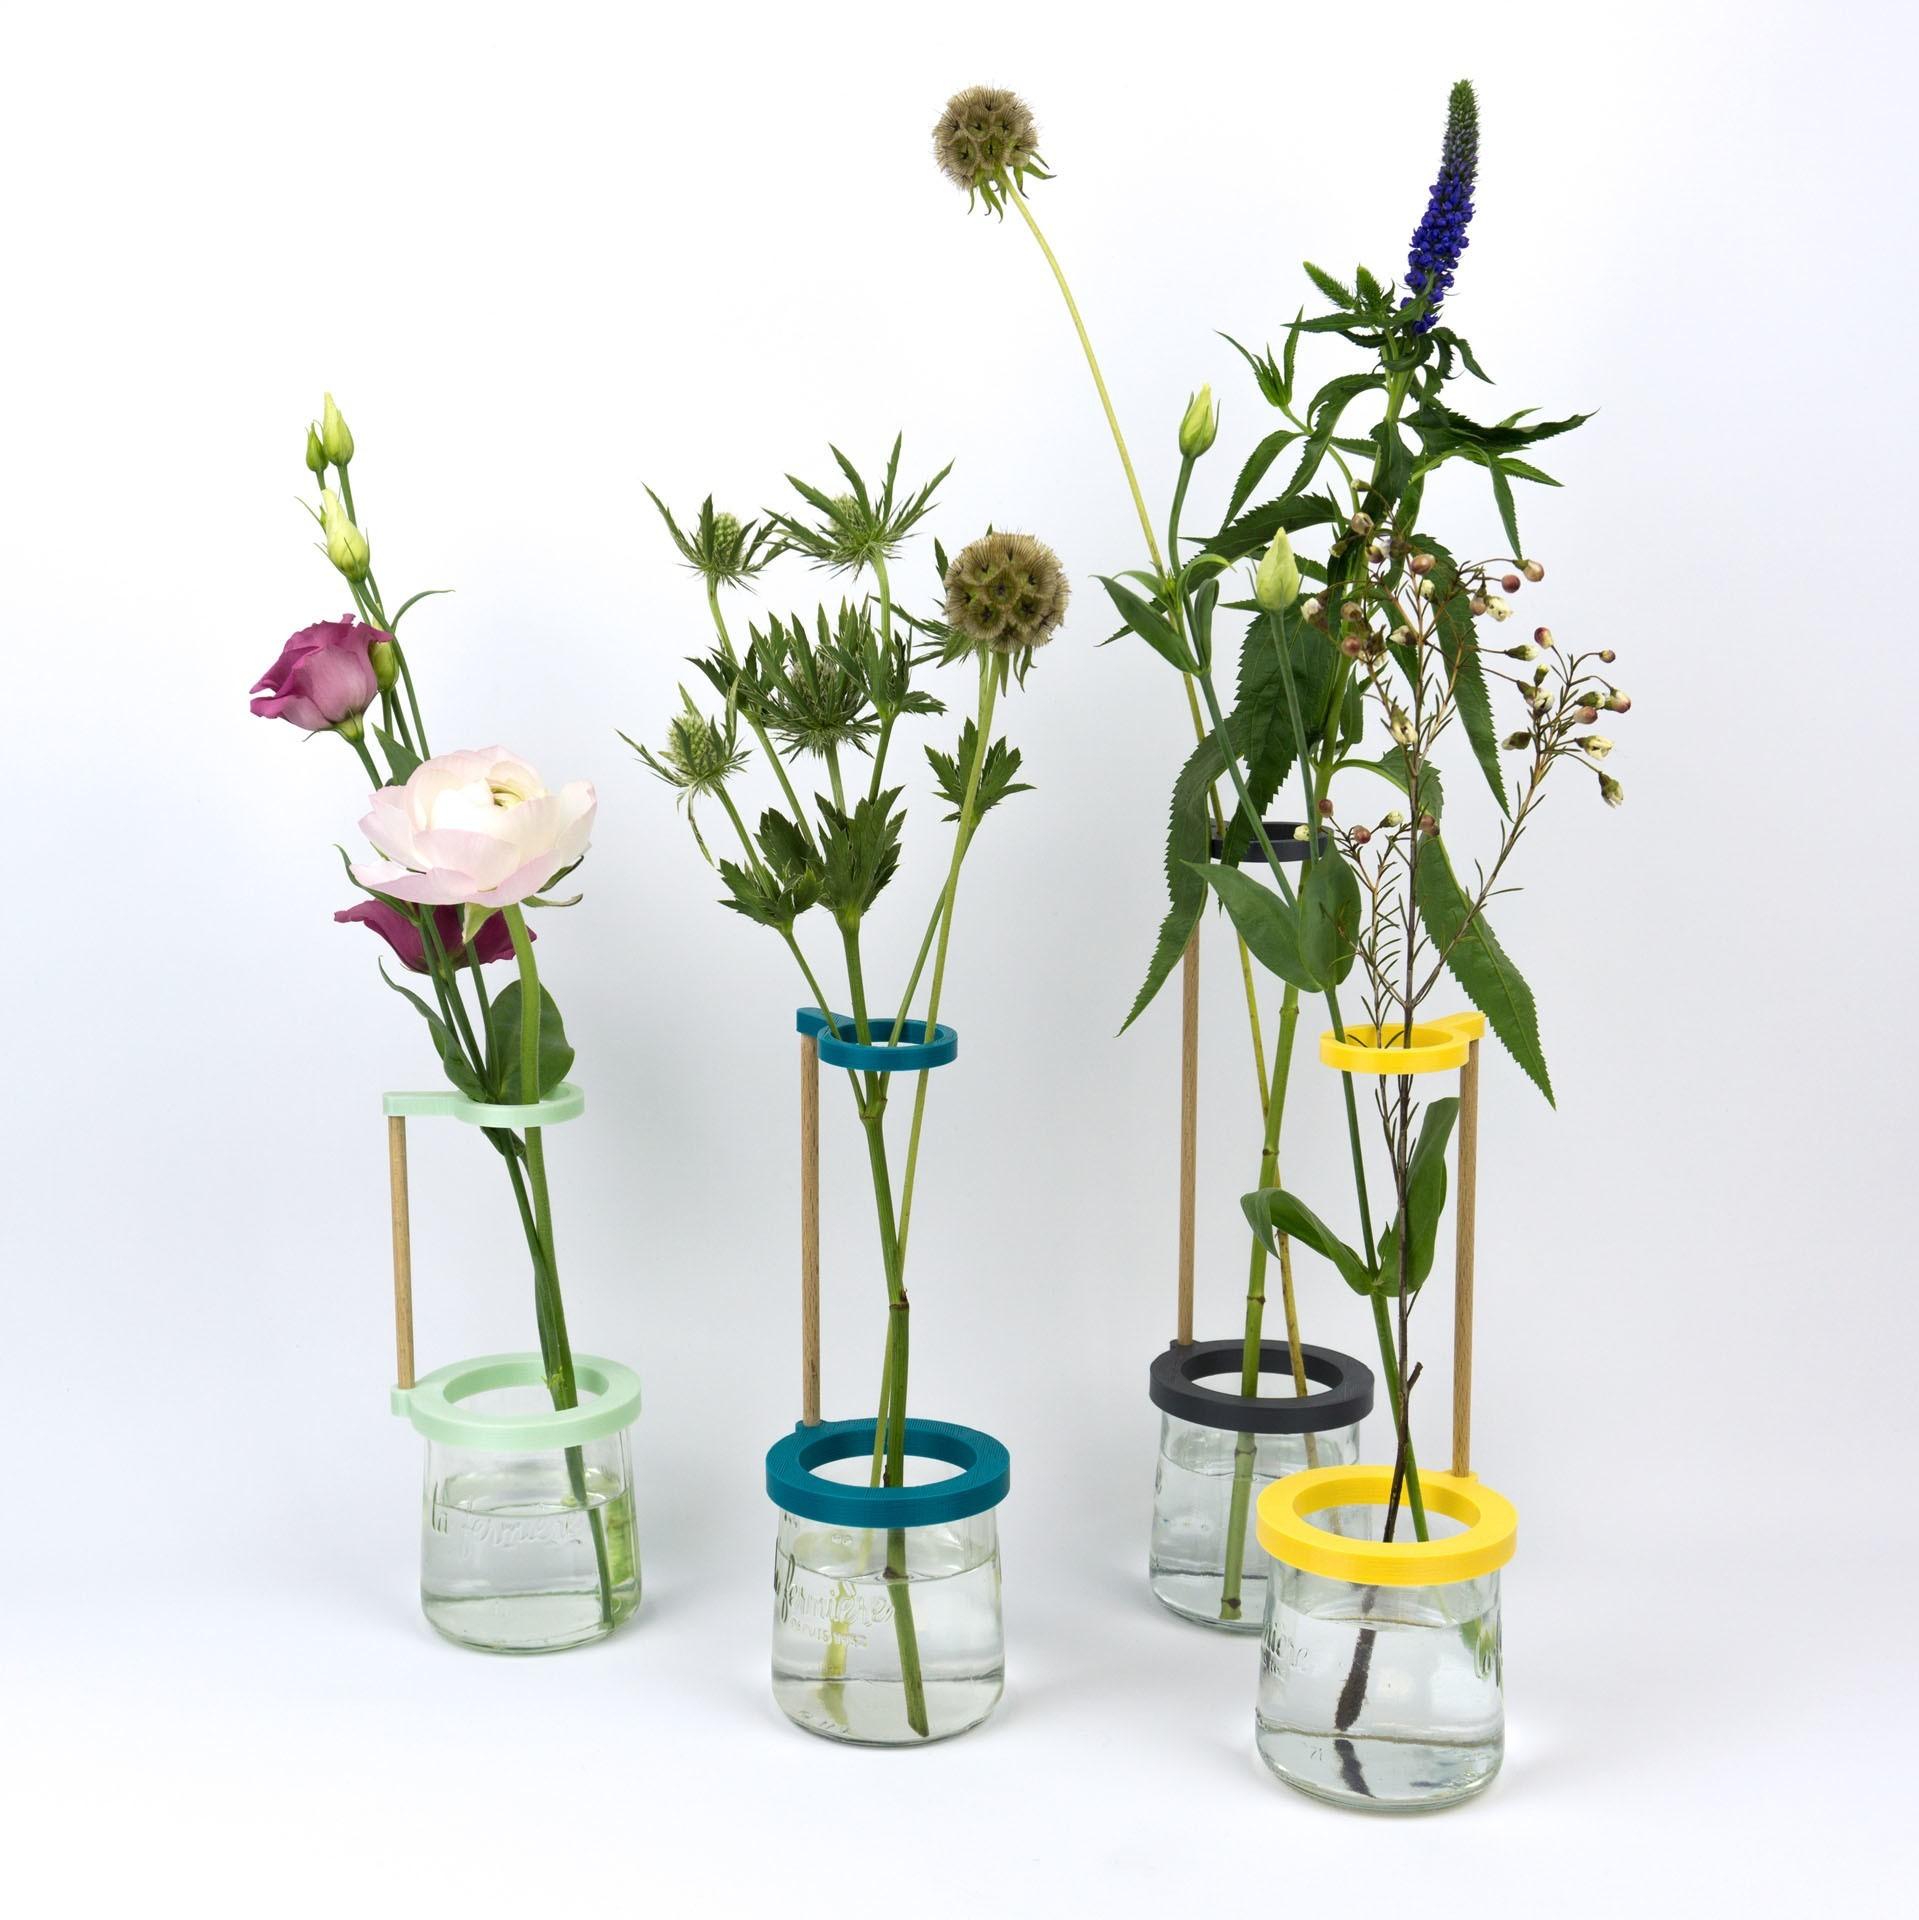 Shooting Pots et impression 3D - 2018 02 10 - 1.jpg Download STL file Stem vase / Vase to be fixed on a glass pot • 3D print object, Jonathan-AtelierVOUS